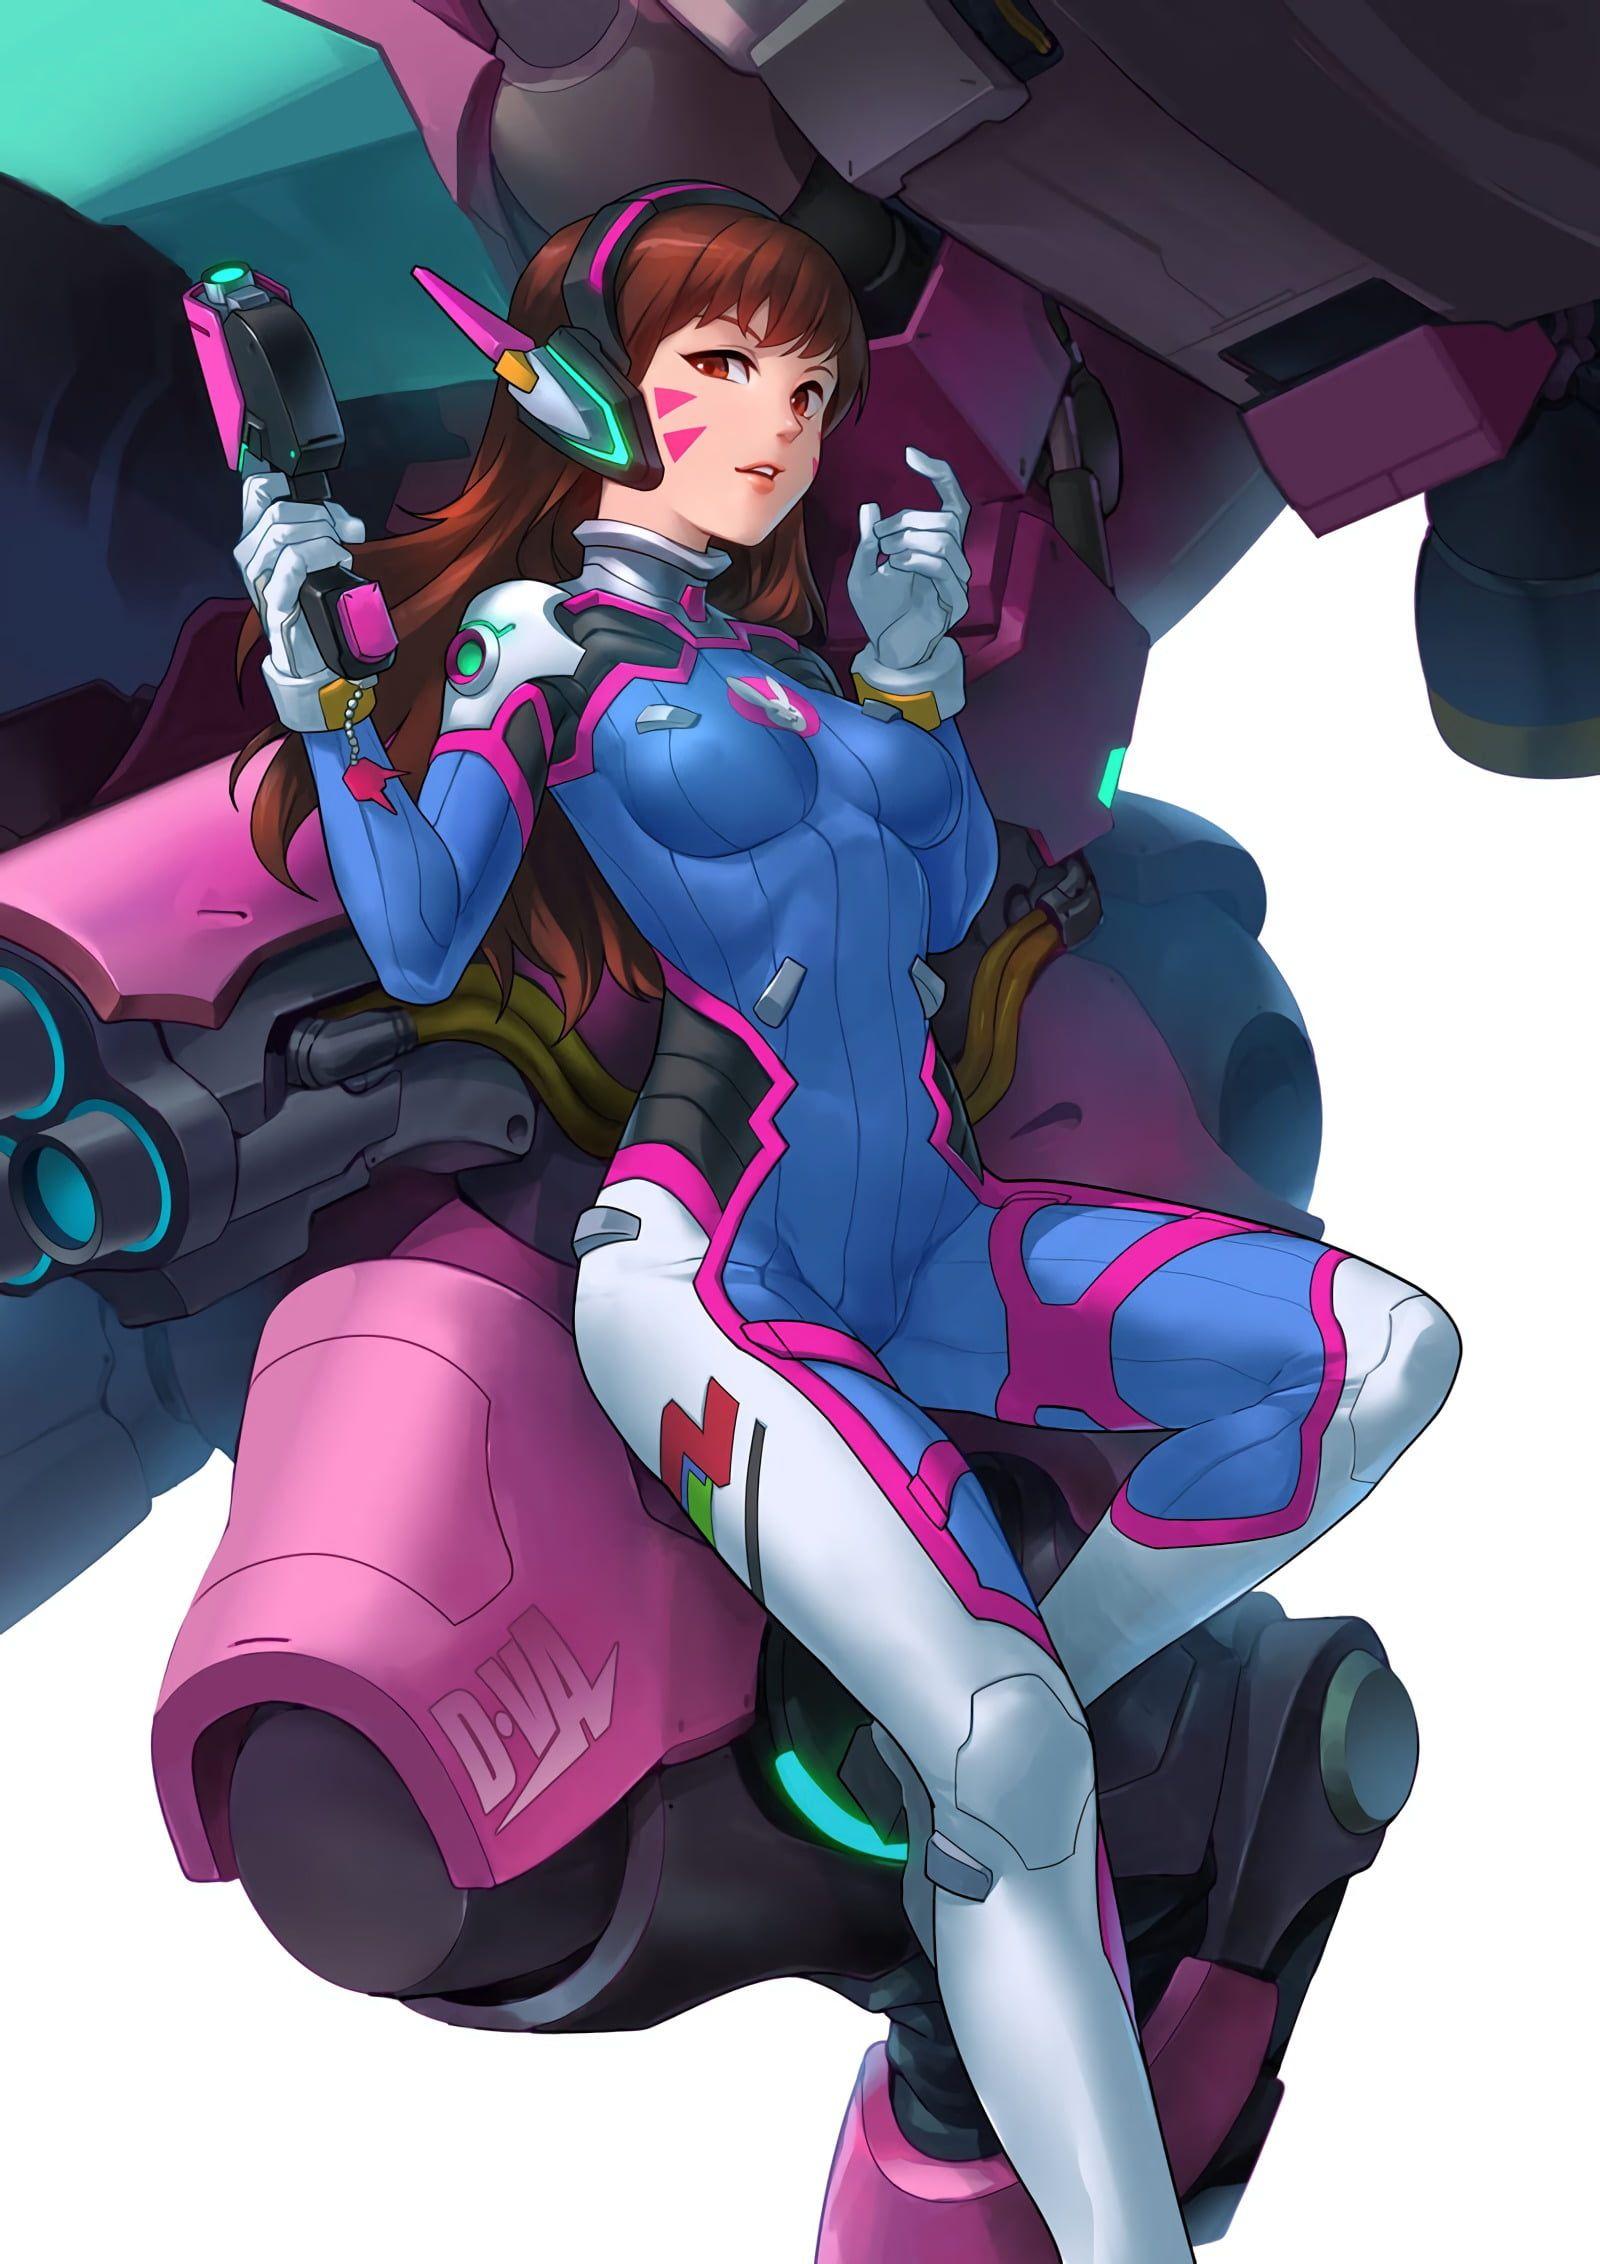 redhaired female character illustration digital art